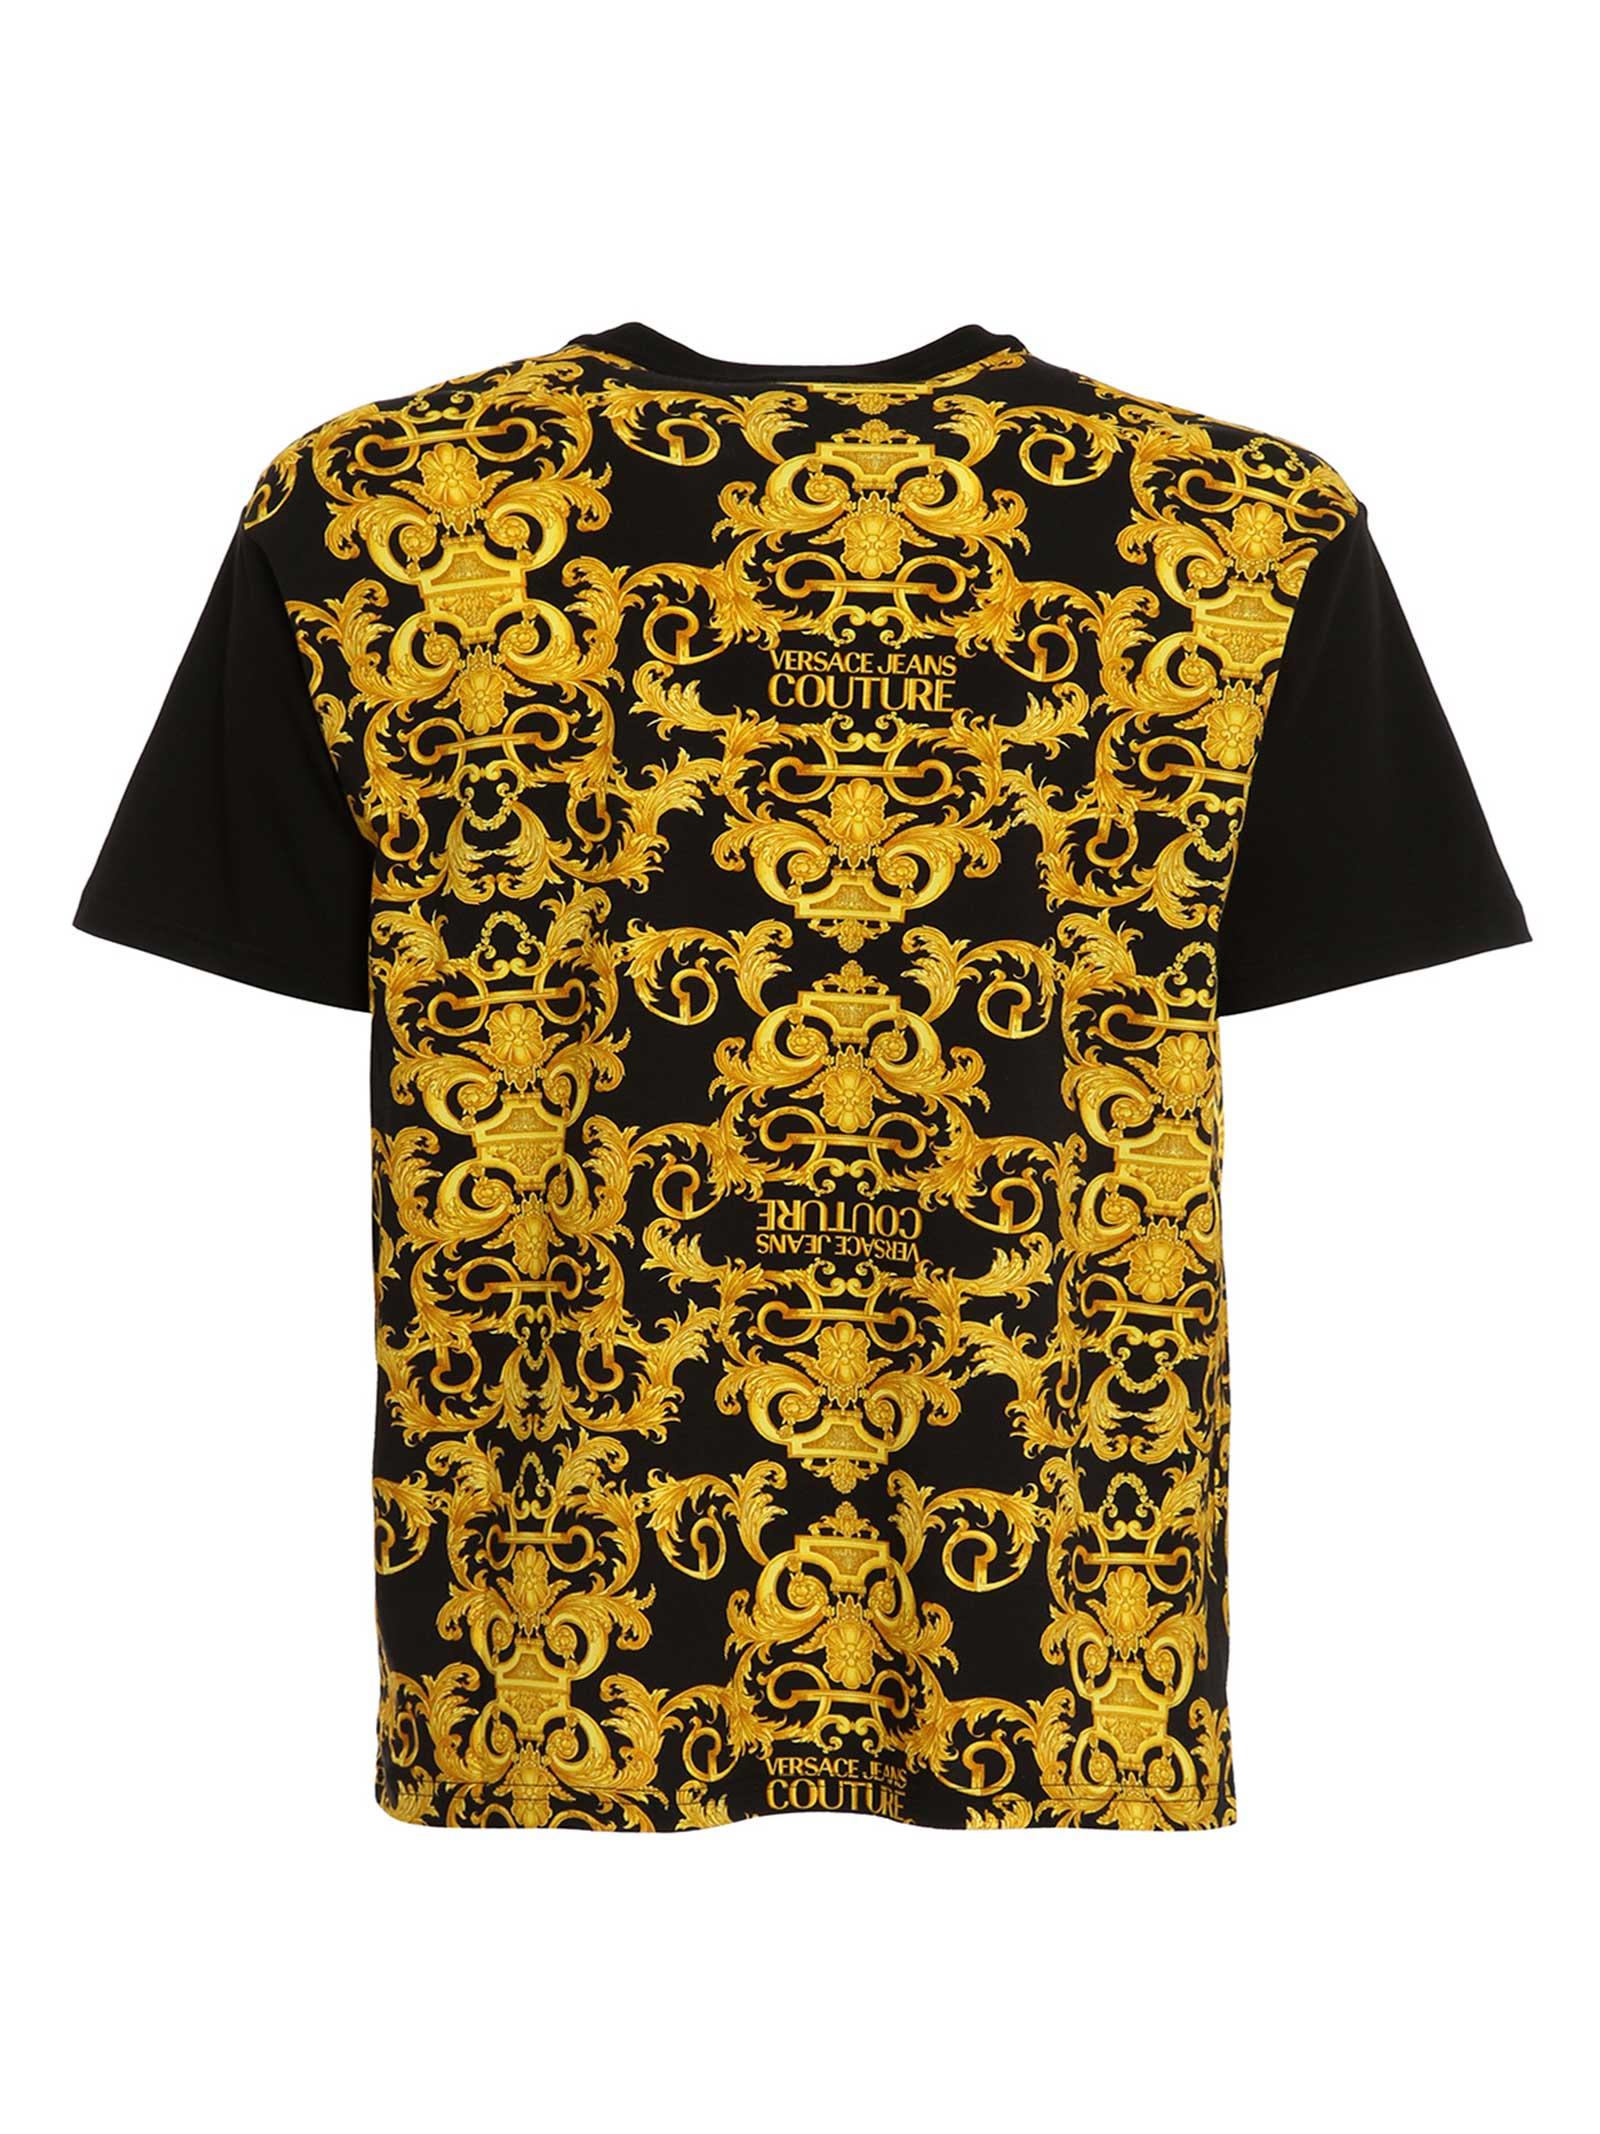 T-shirt Maniche Corte VERSACE JEANS | T-shirt | B3 GWA7R1S0155 899